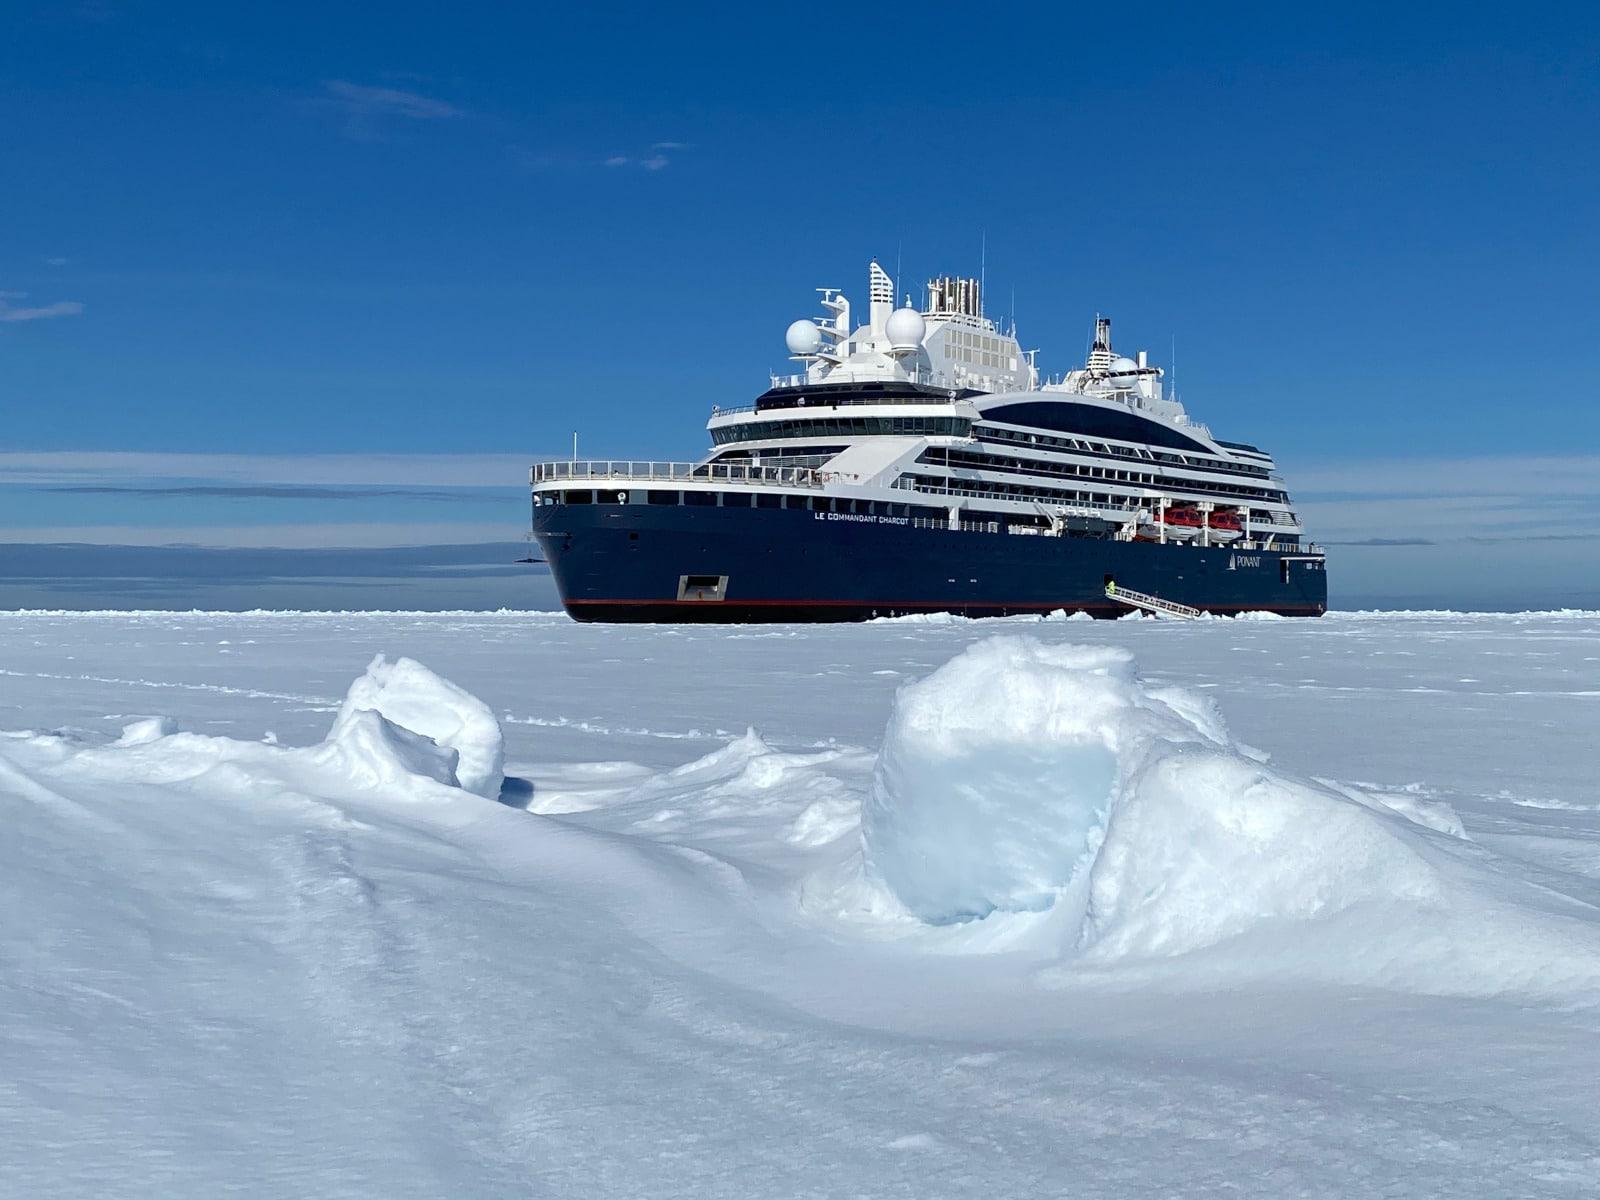 IMG_2194_Commandant-CHARCOT_Groenland-Juin2021©PONANT-Nicolas Dubreuil